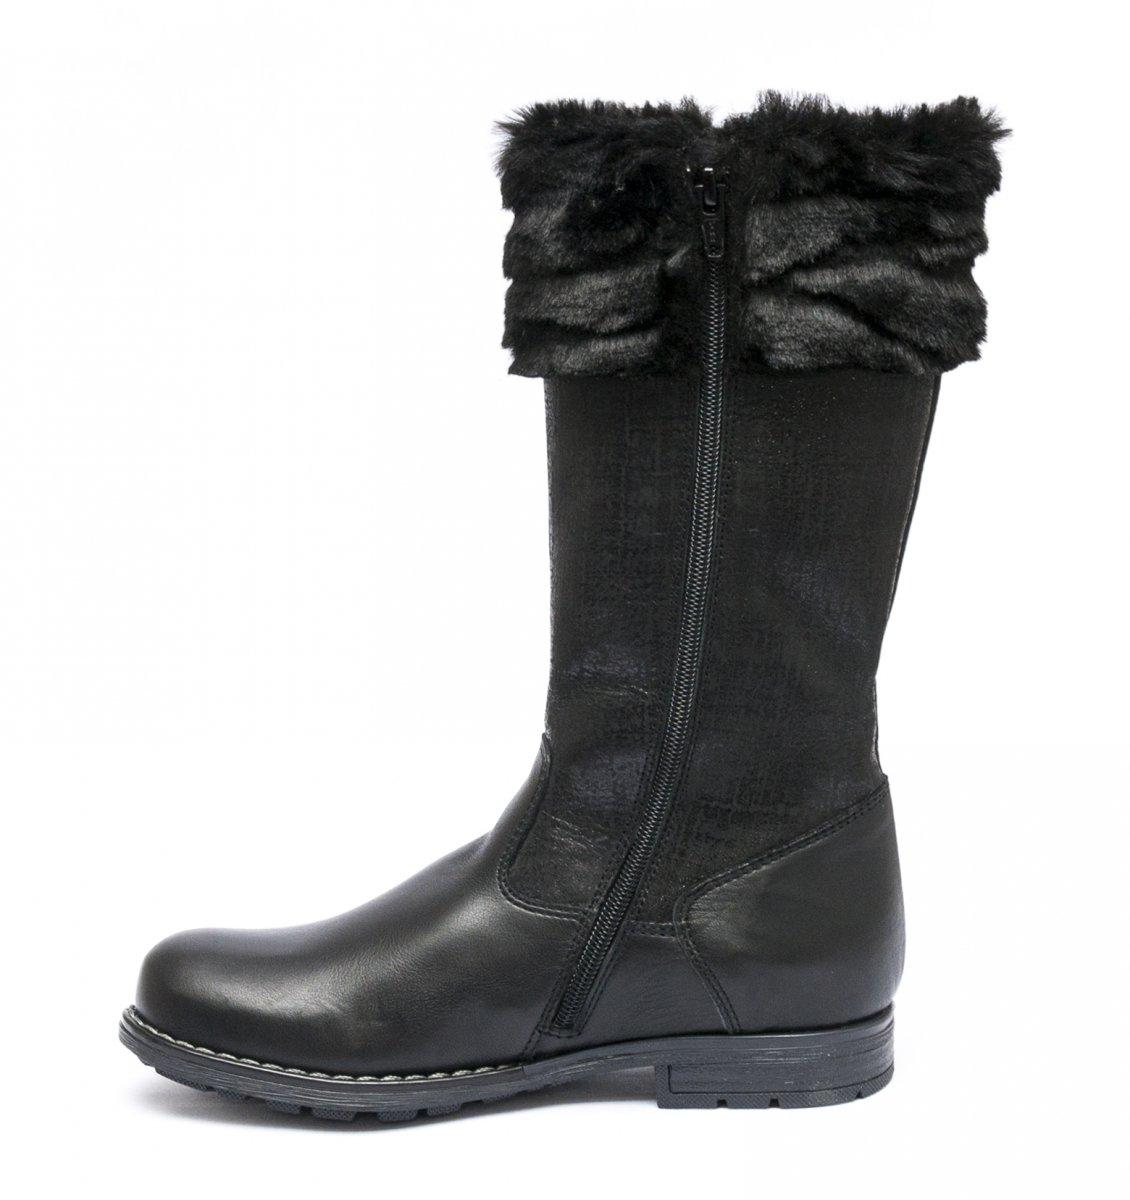 Cizme fete cu blana iarna hokide 415 negru 28-37